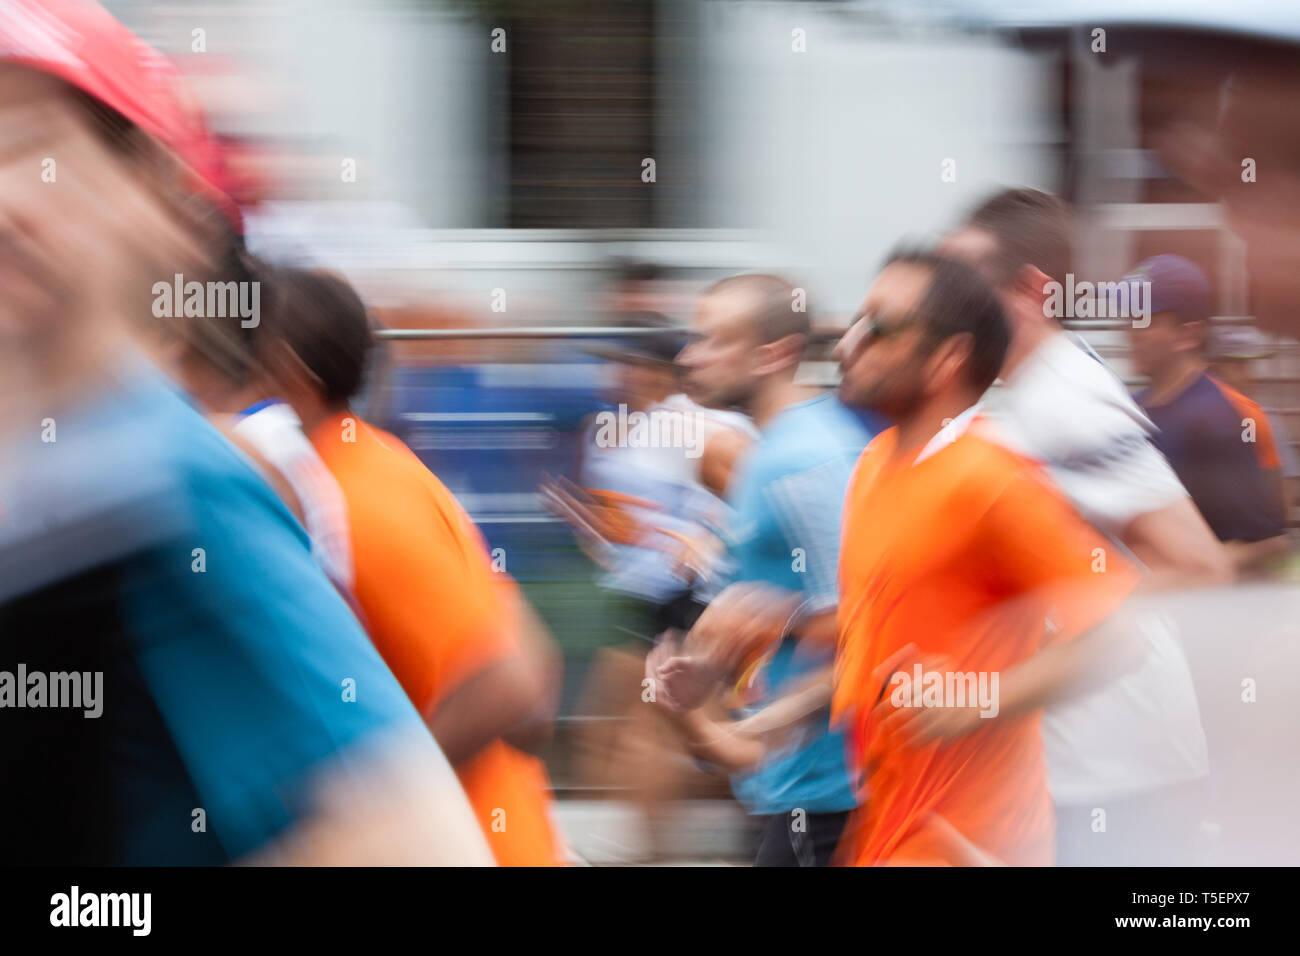 Blur motion, abstract background, long exposure shoot of competitors at Corrida Internacional (International Race) de Sao Silvestre, Sao Paulo, Brazil Stock Photo